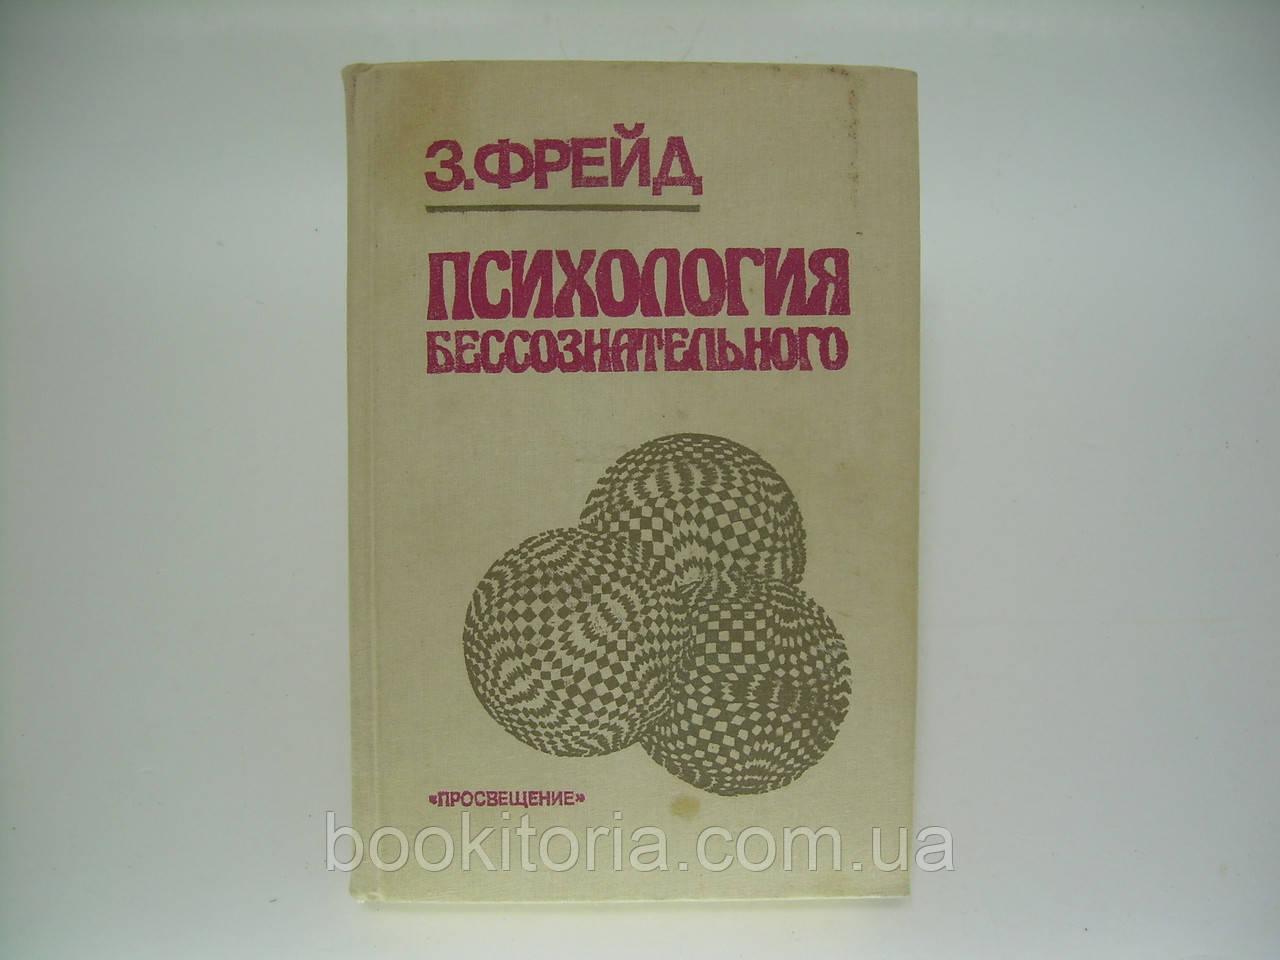 Фрейд З. Психология бессознательного. Сборник произведений (б/у).